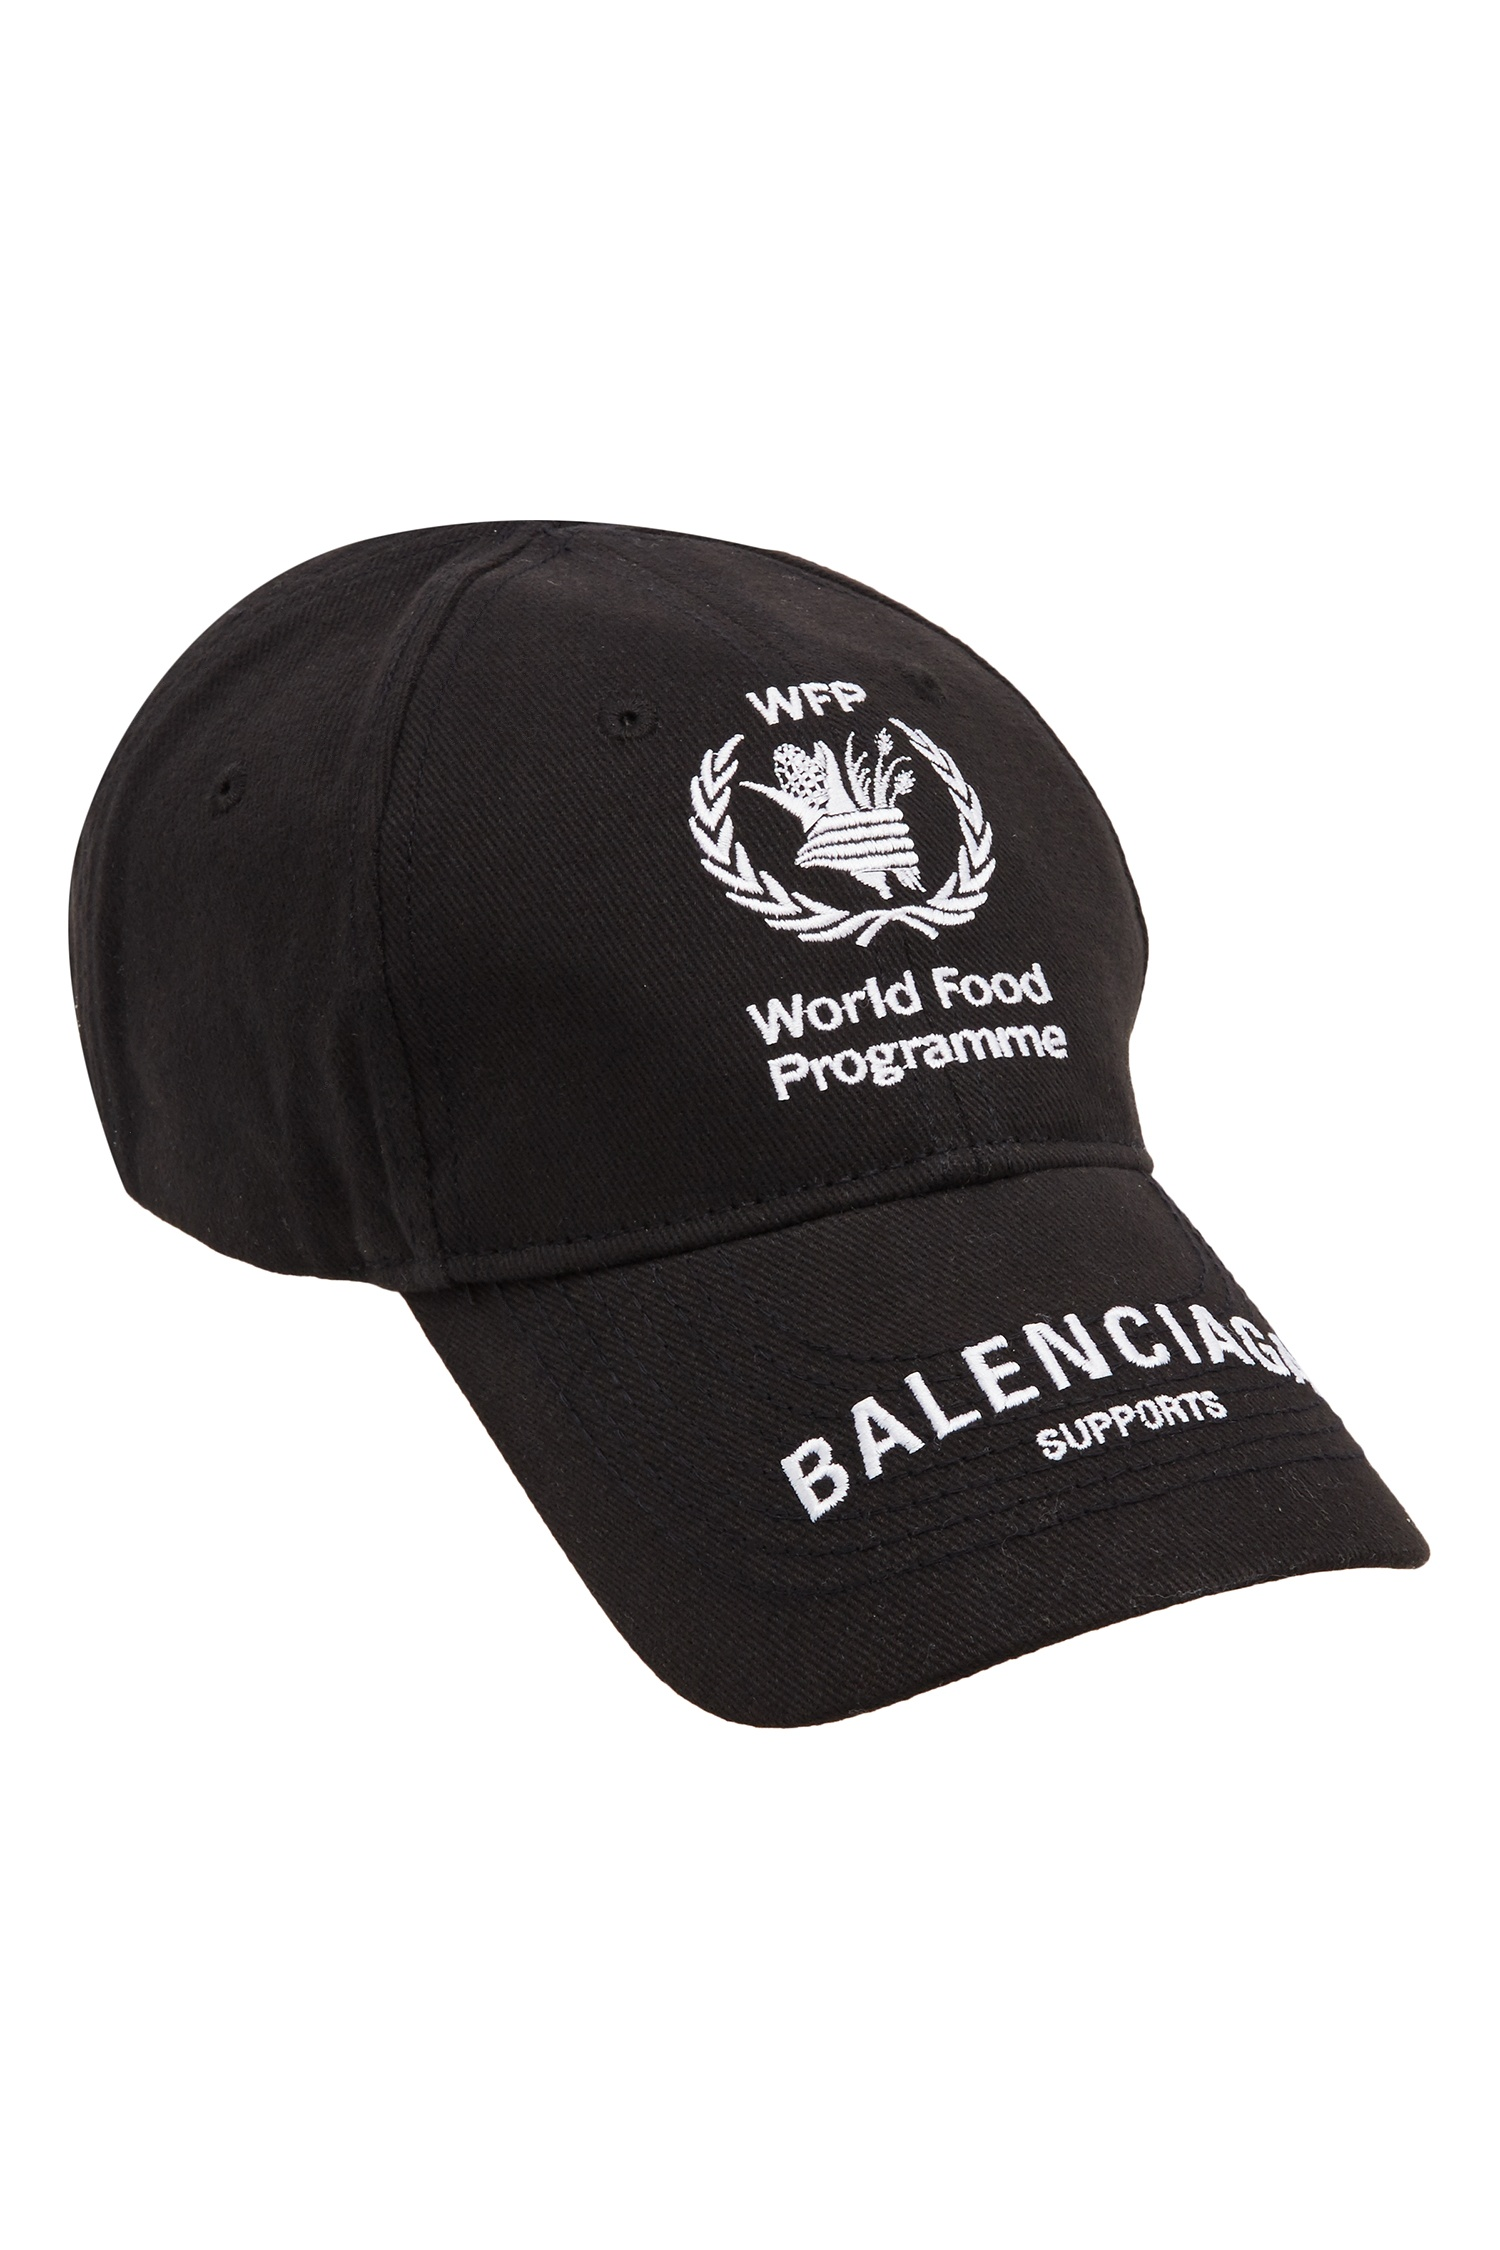 2f530da9305 Черная кепка World Food Programme Balenciaga Man – купить в интернет ...